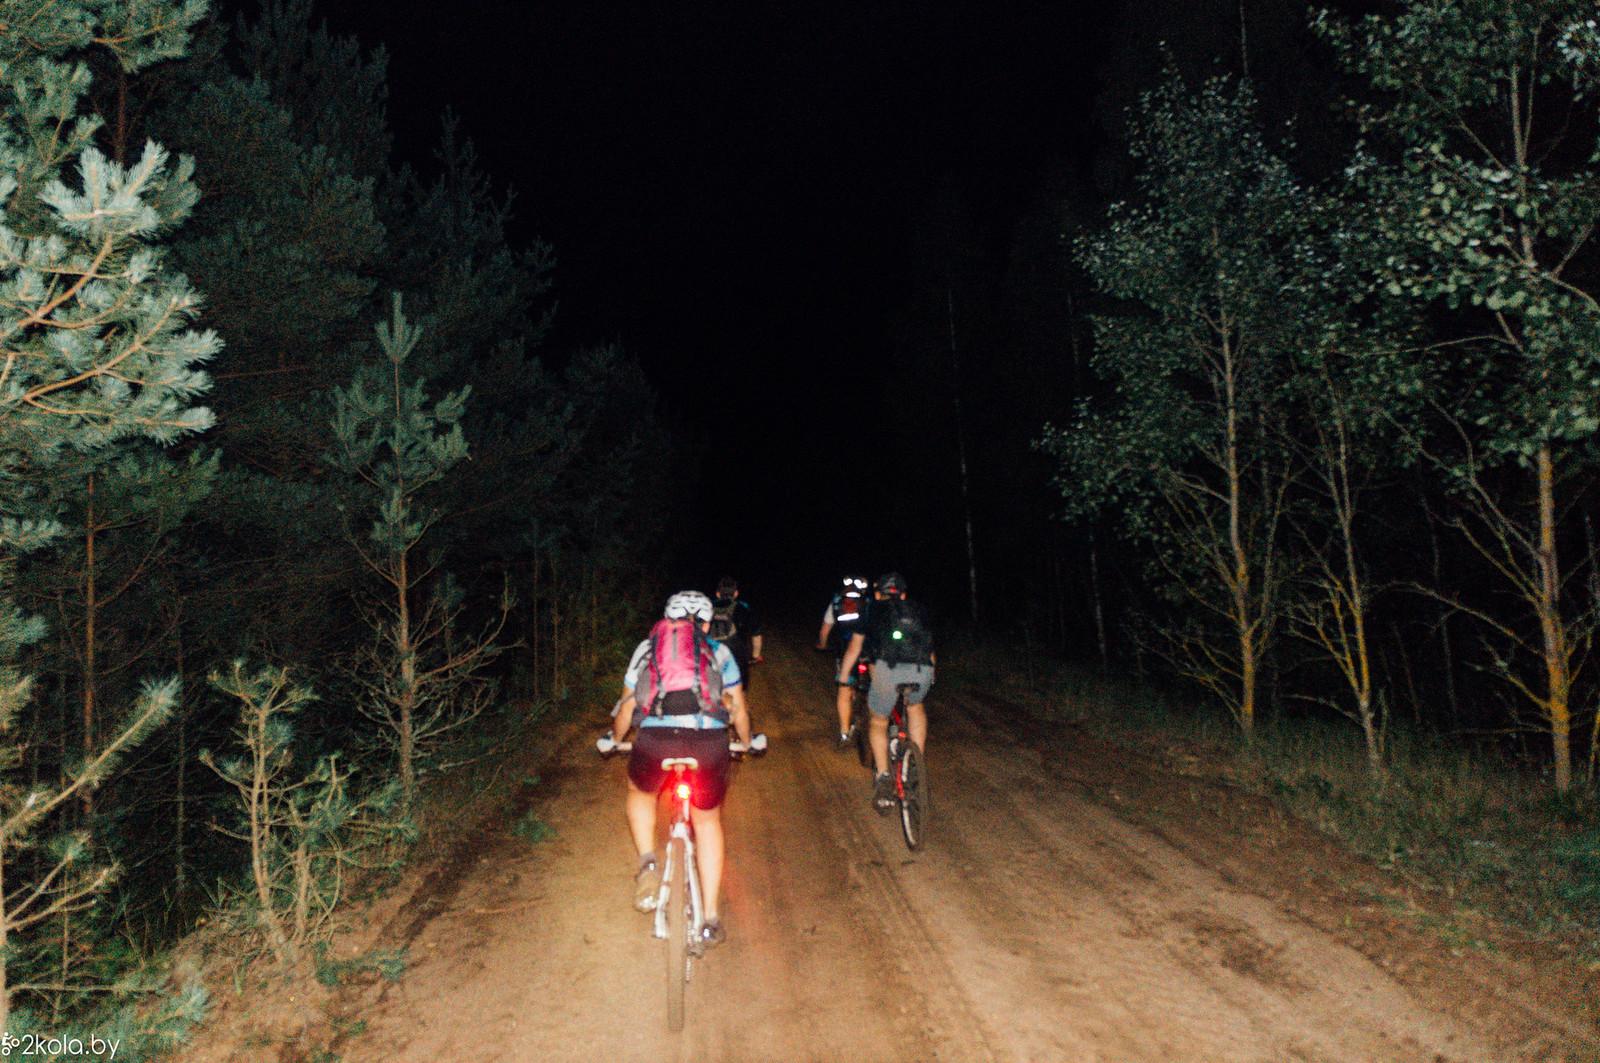 35589817093 4831a5a58a h - Ночная велопокатушка 2017 (Тимковичи - Люща)